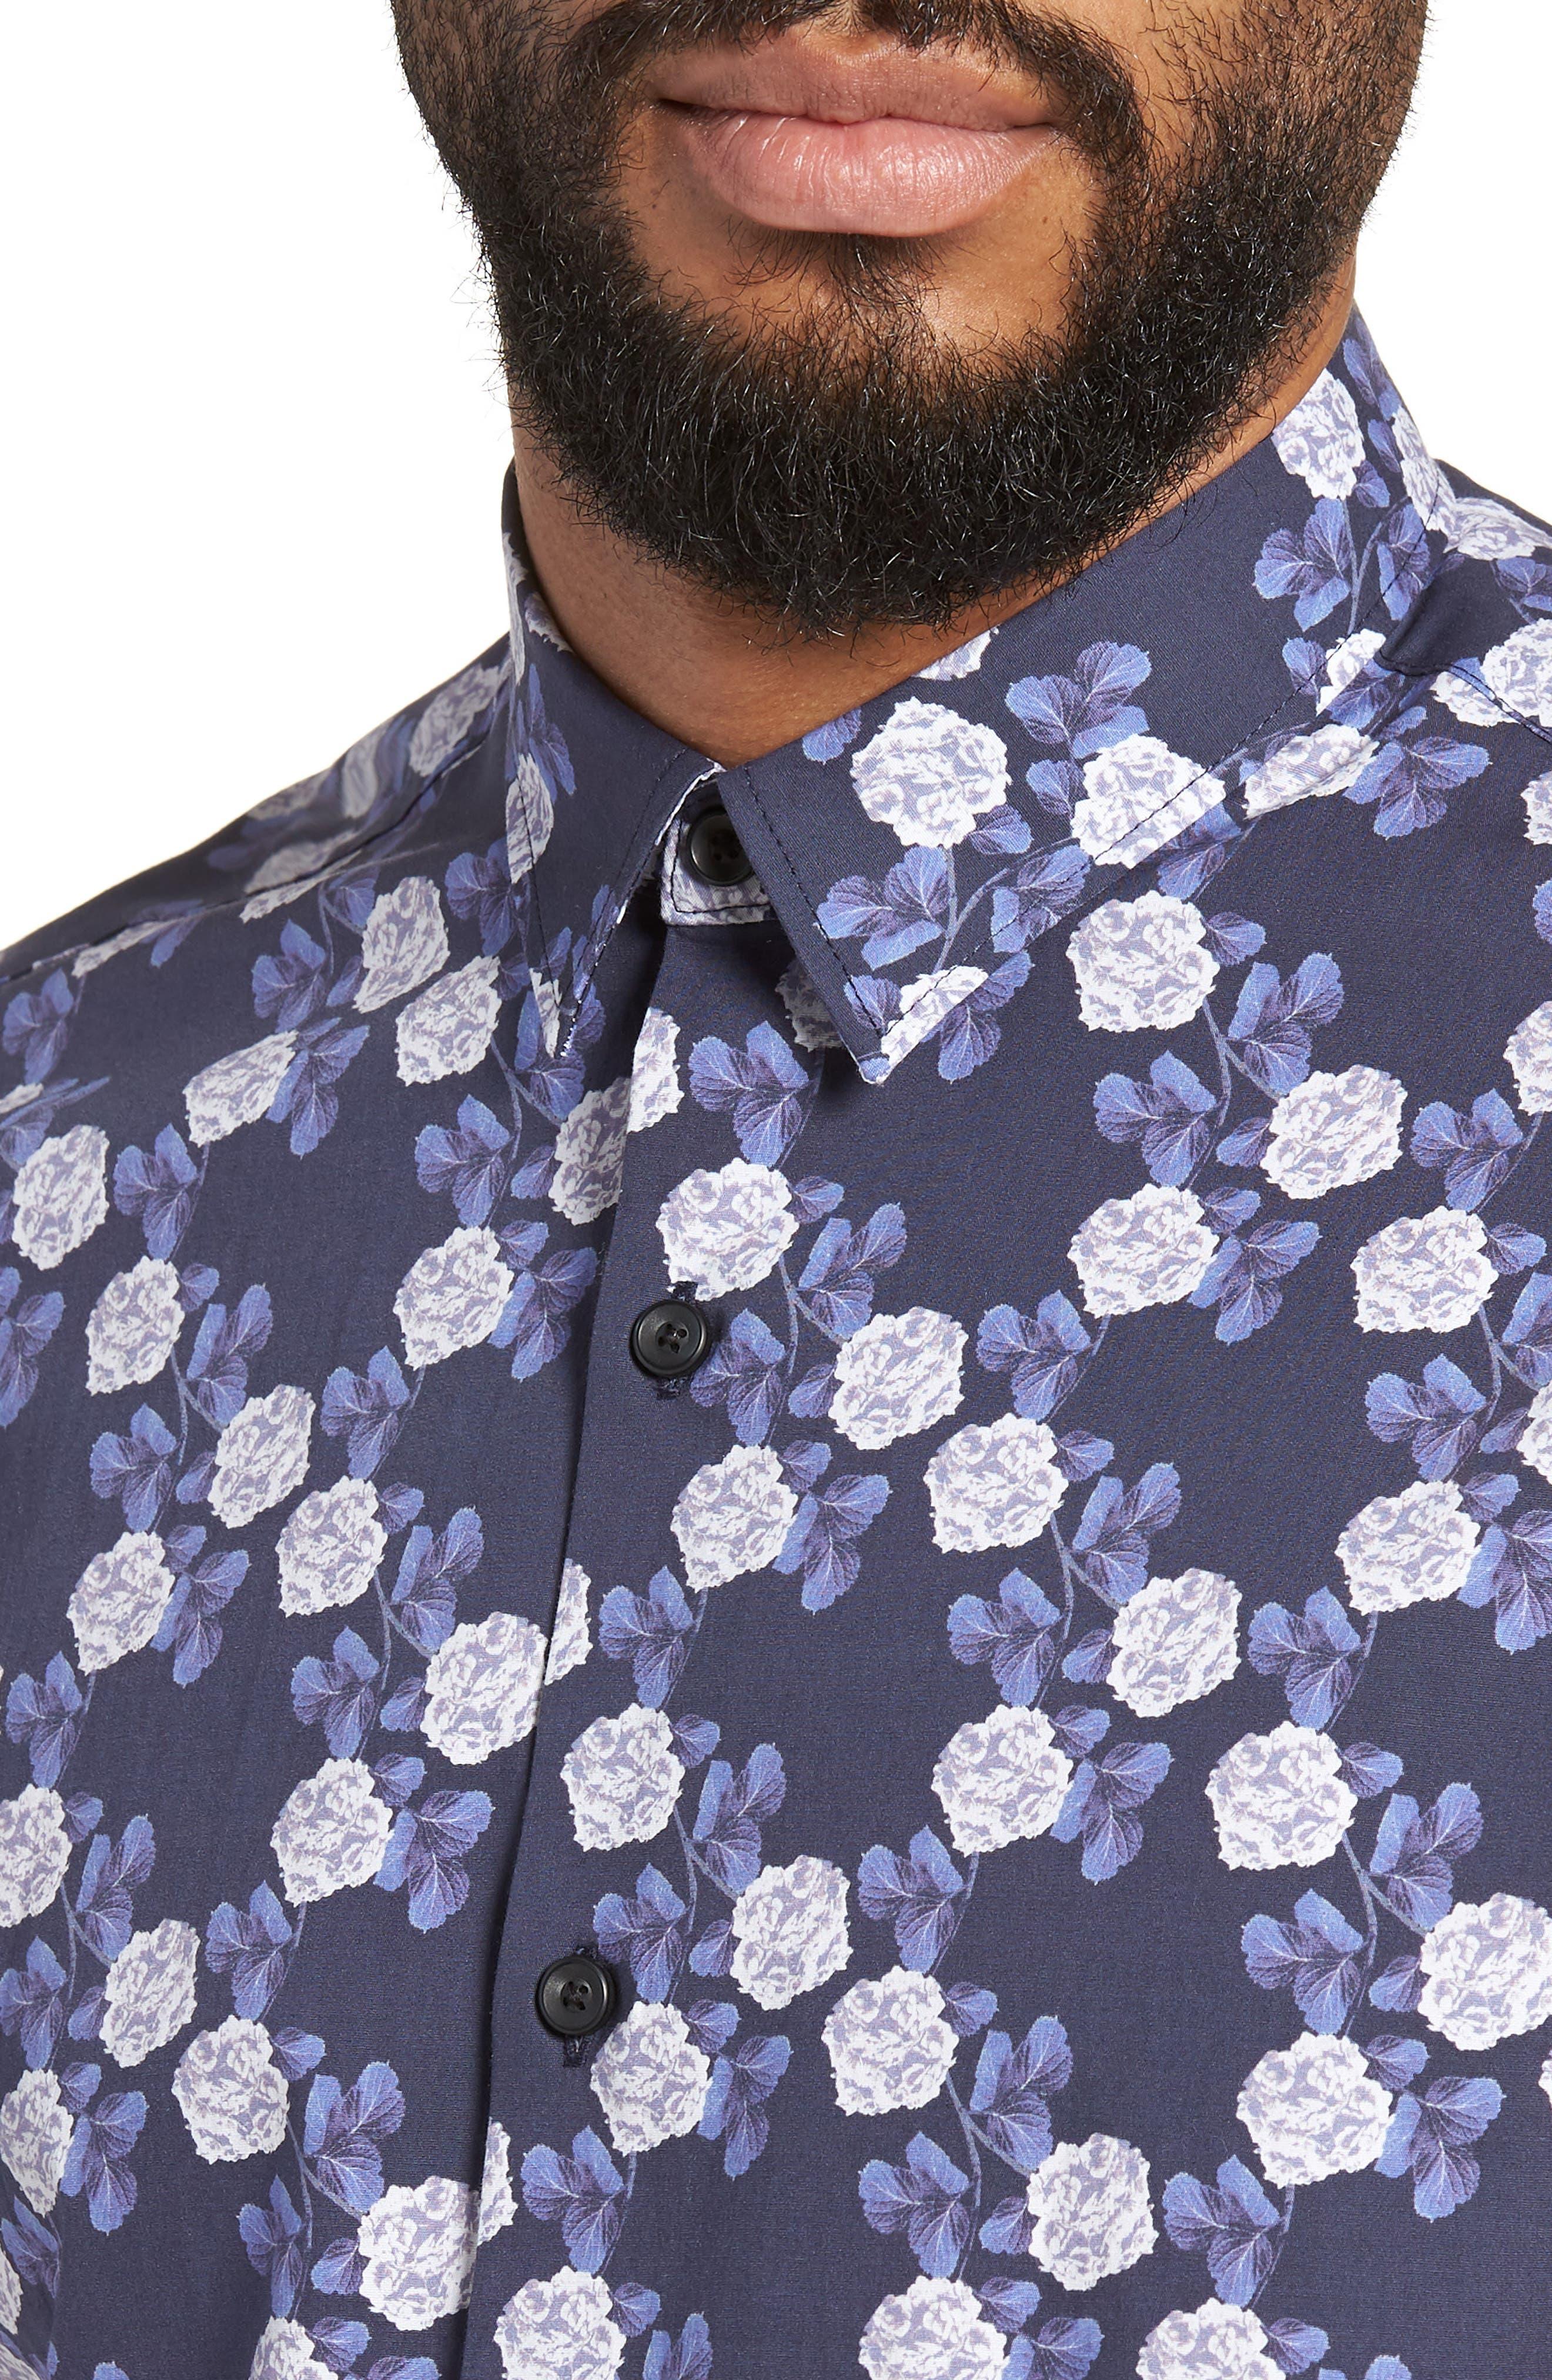 Trim Fit Short Sleeve Sport Shirt,                             Alternate thumbnail 2, color,                             Blue Flower Print